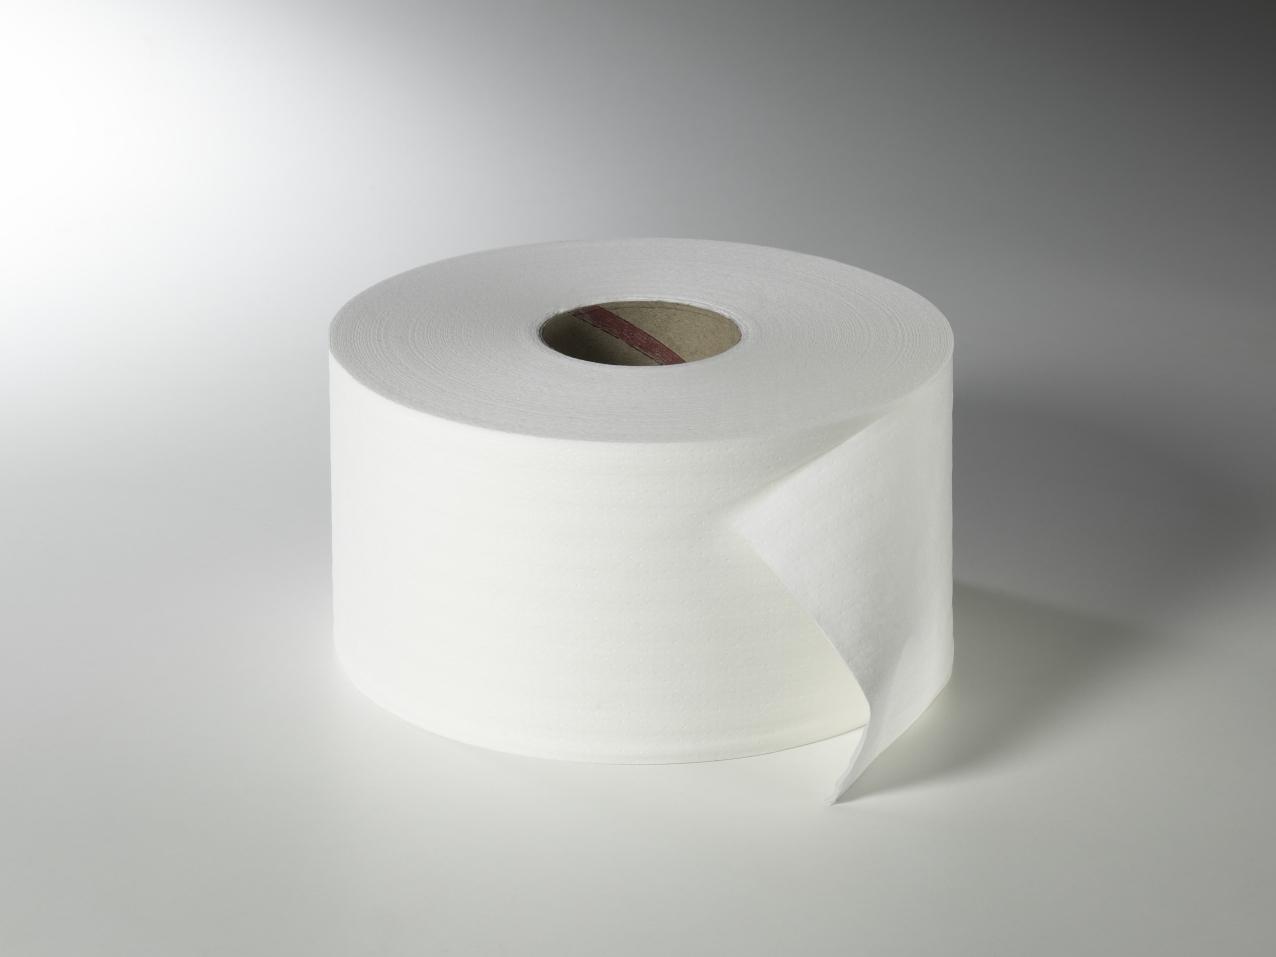 Fripa - Toilettenpapier maxi, 2-lagig, 200 m, nicht perforiert (12 Rl.)